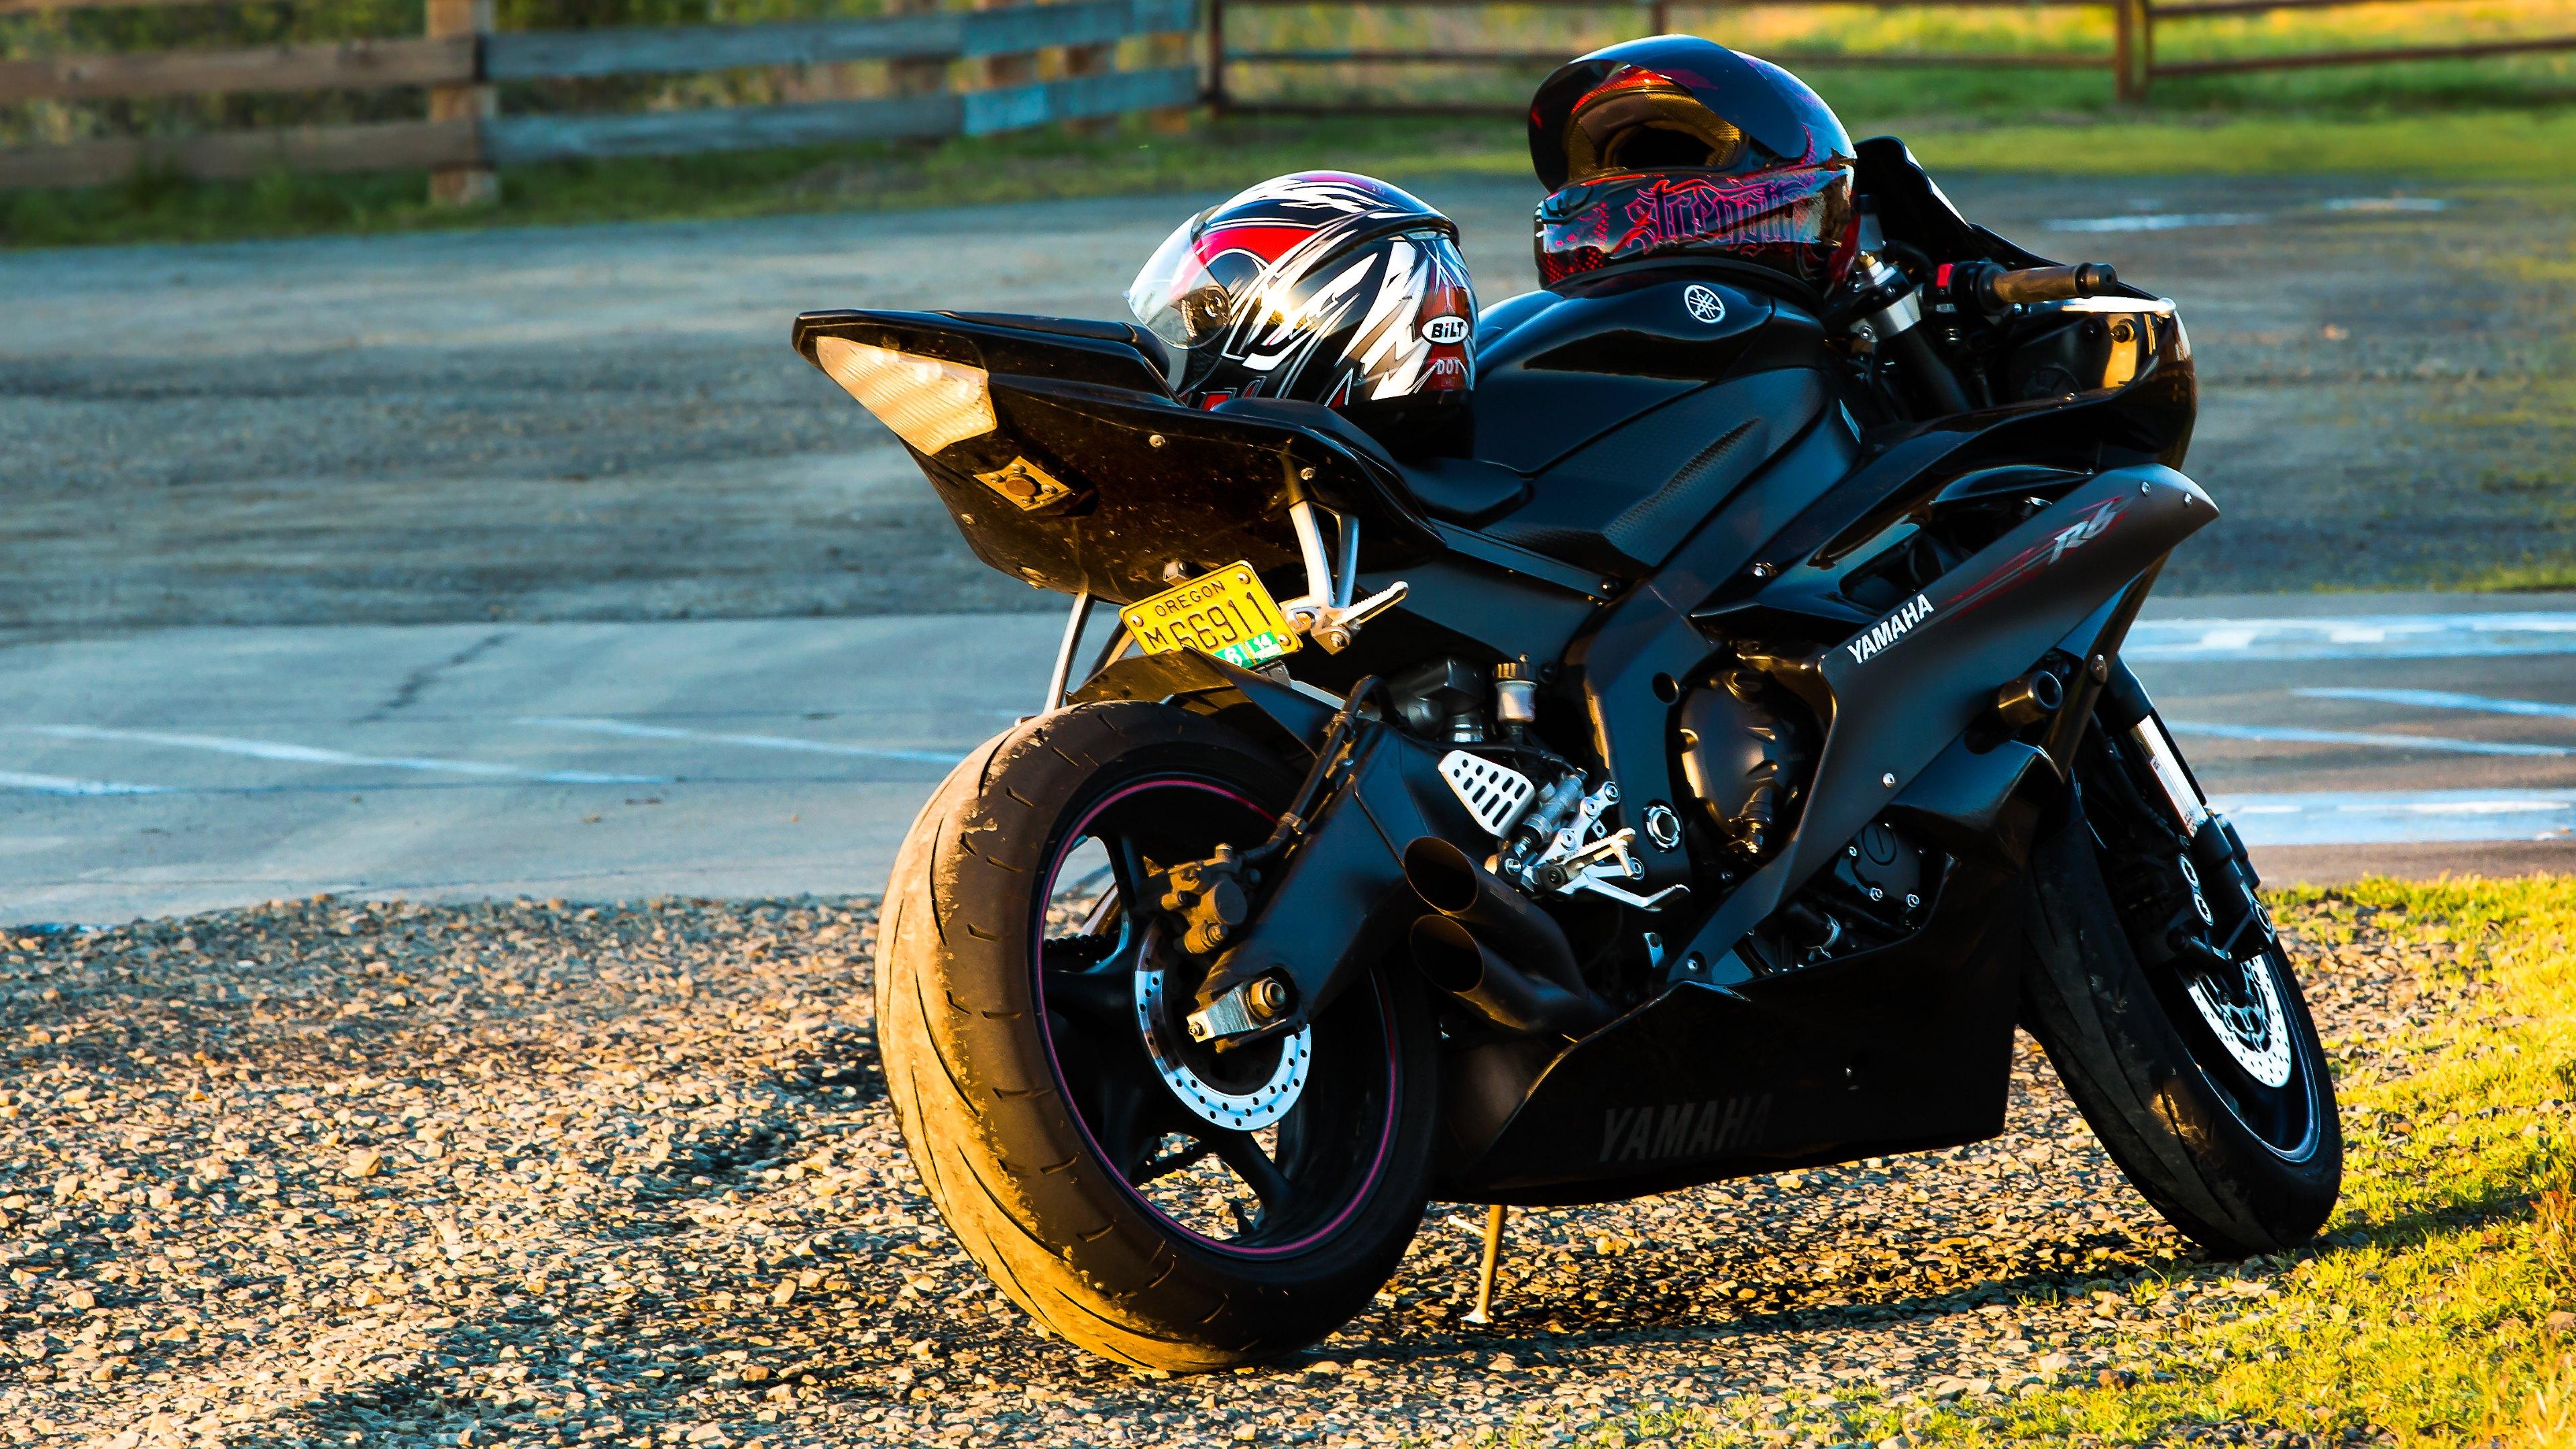 motorcycle super bike yamaha r6 wallpaper hd wallpapers